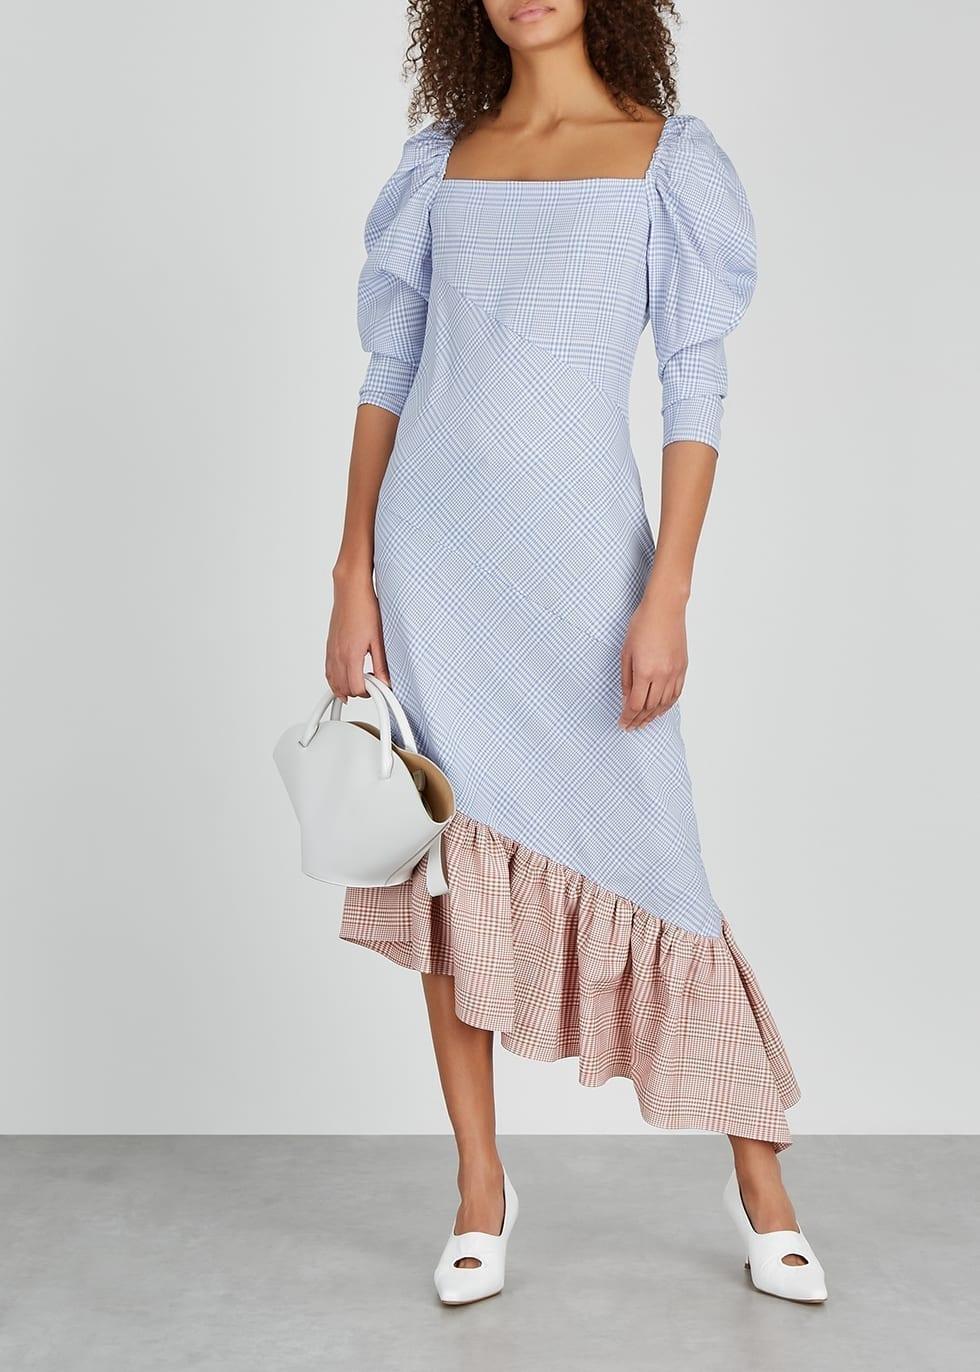 PUSHBUTTON Blue Gingham Seersucker Midi Dress